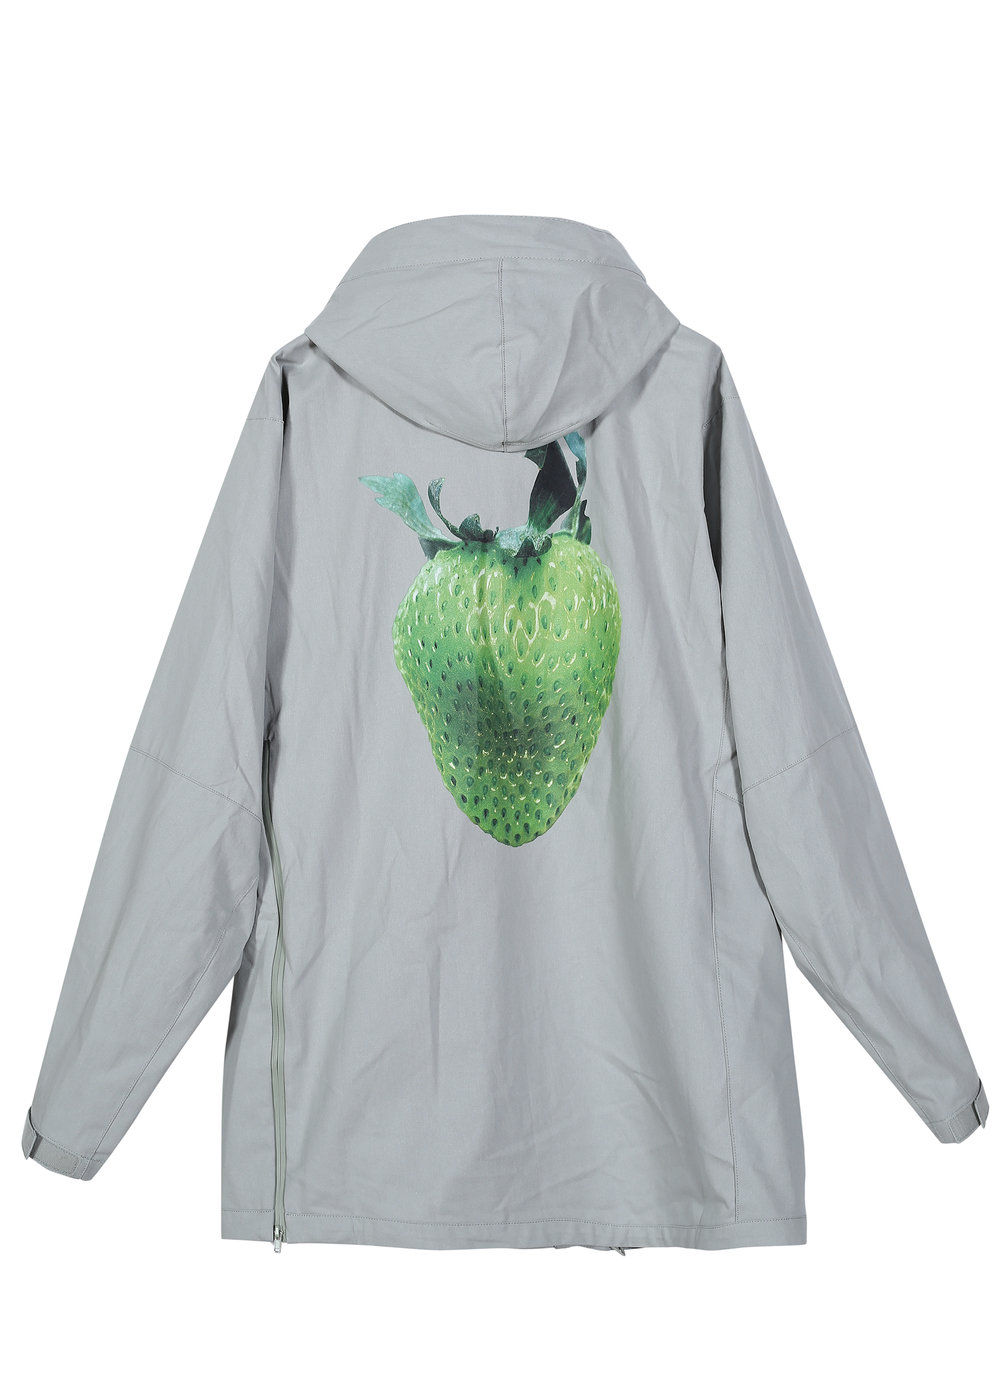 Strawberry-Print Hooded Jacket (5I122041)